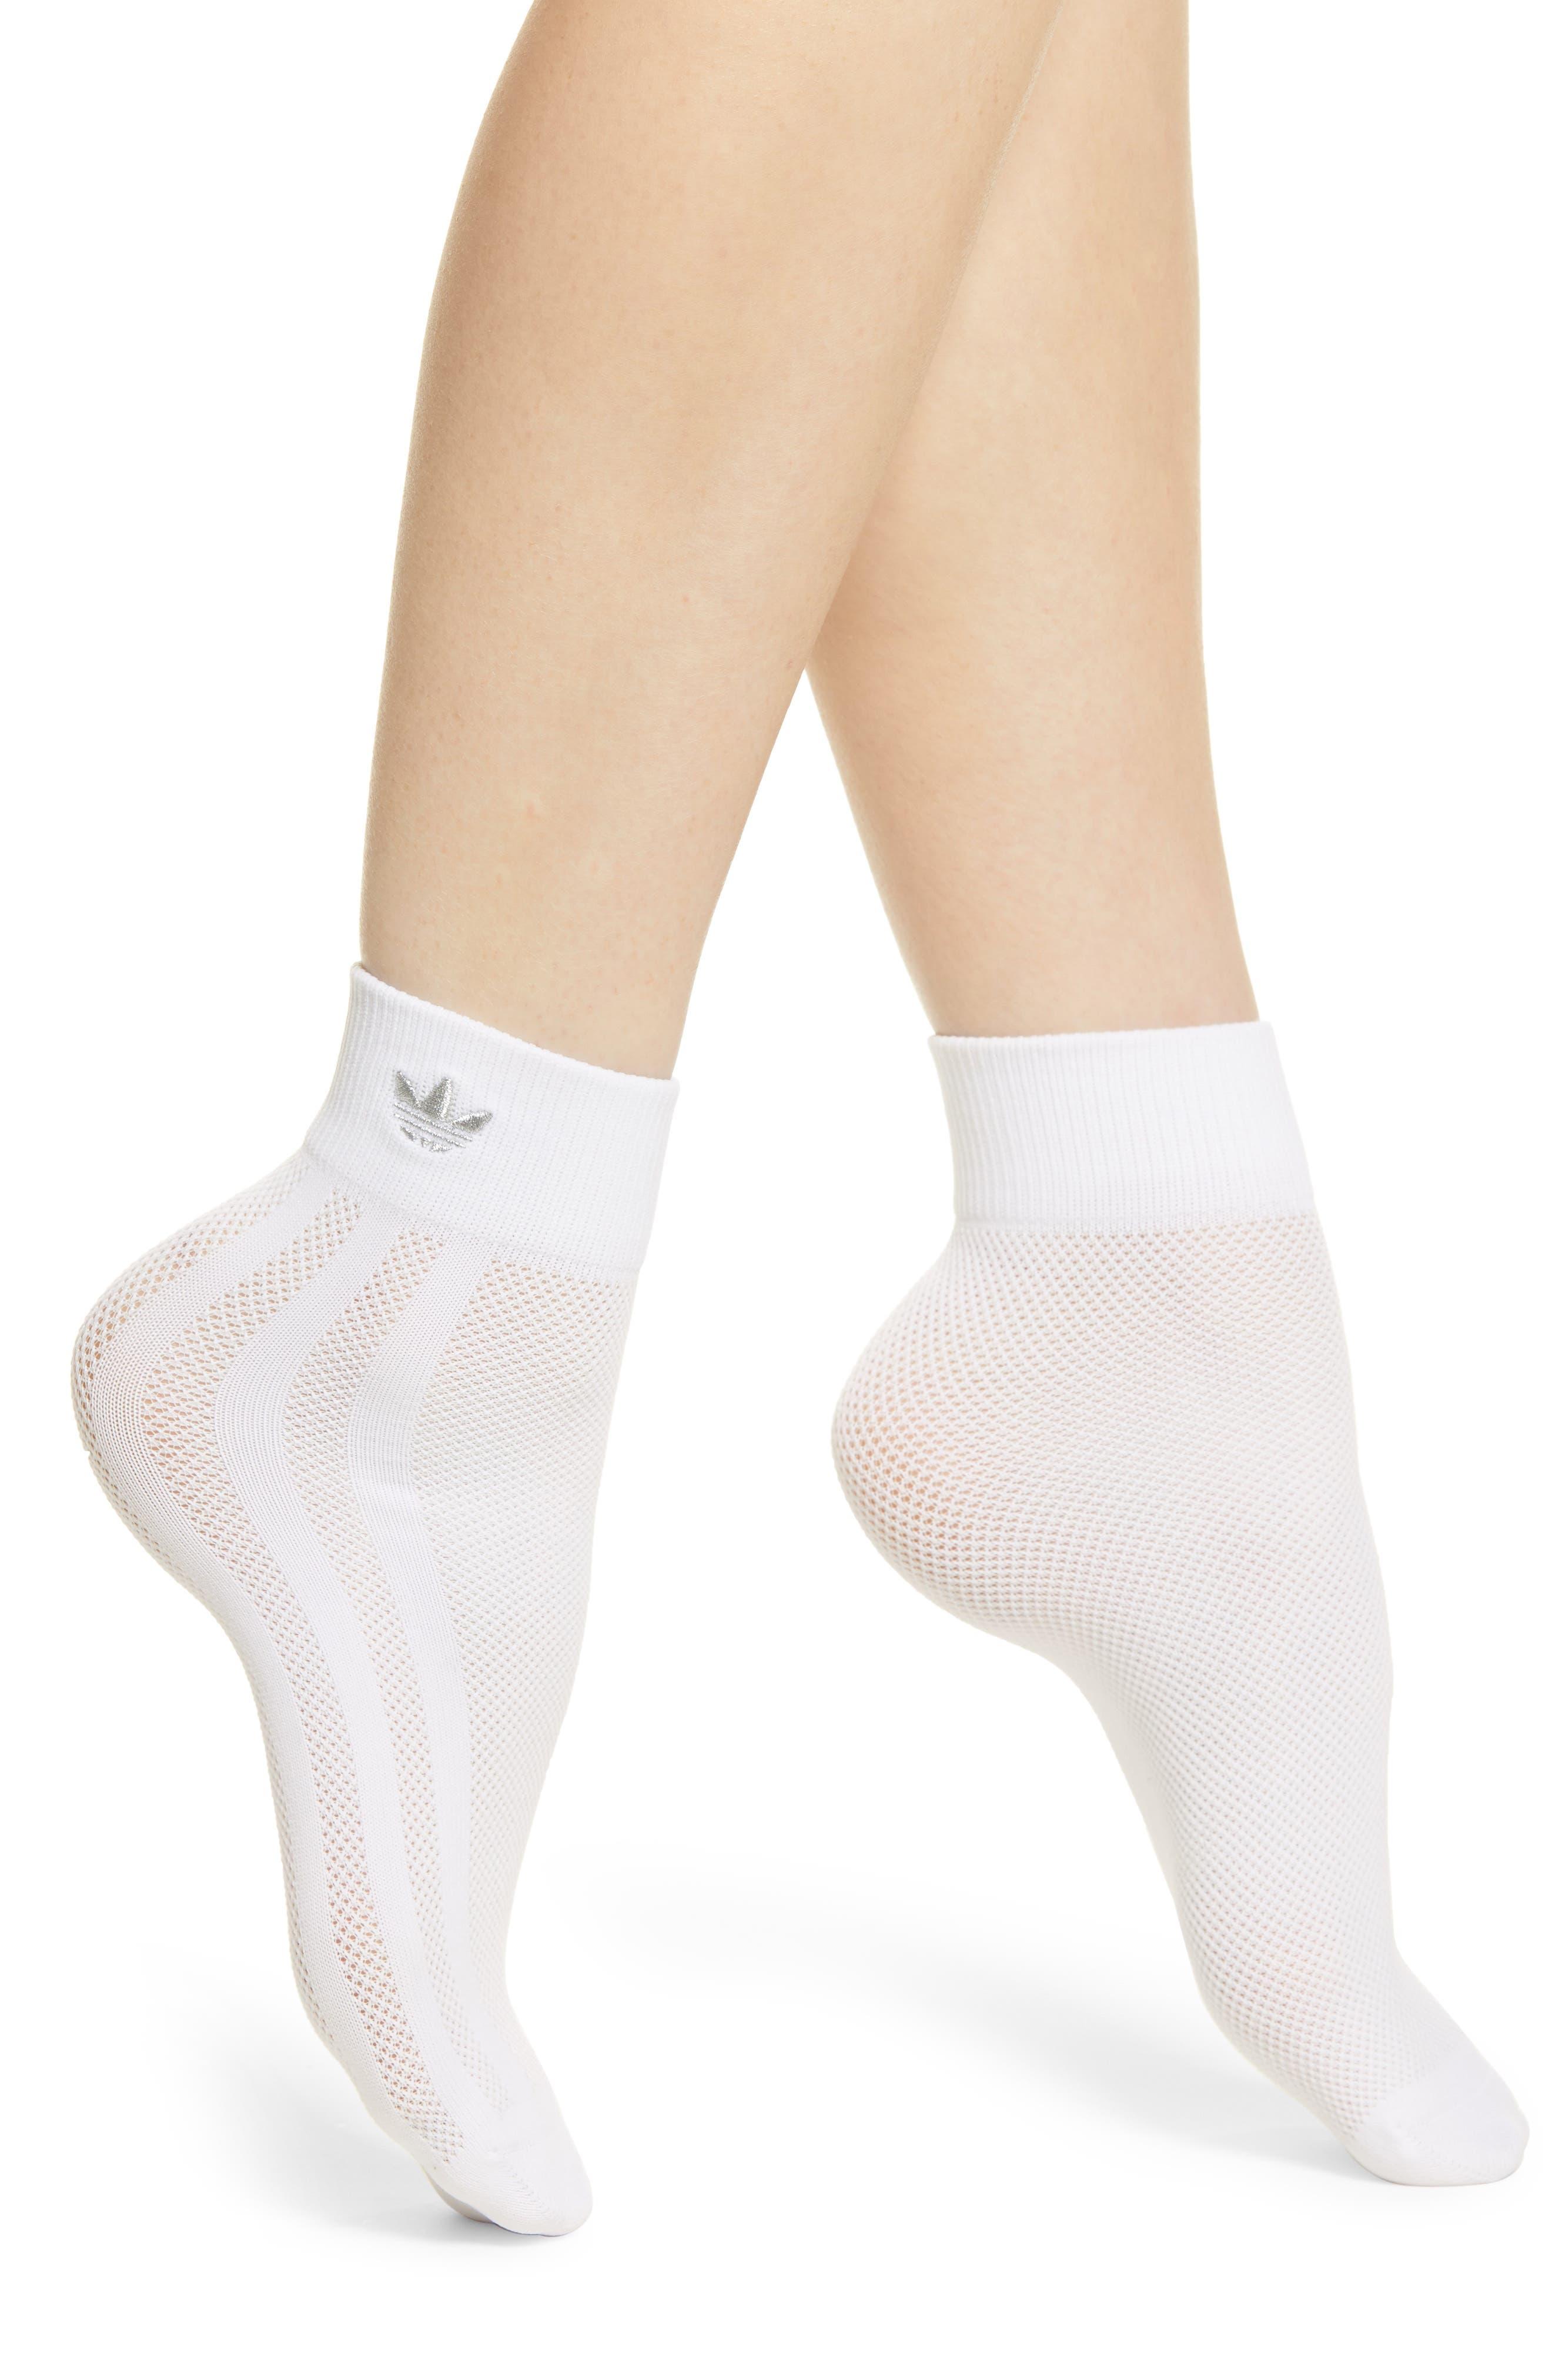 Adidas Socks Socks Clothing, Shoes & Accessories Trefoil Ank Str Pink/blue/green Fancy Colours